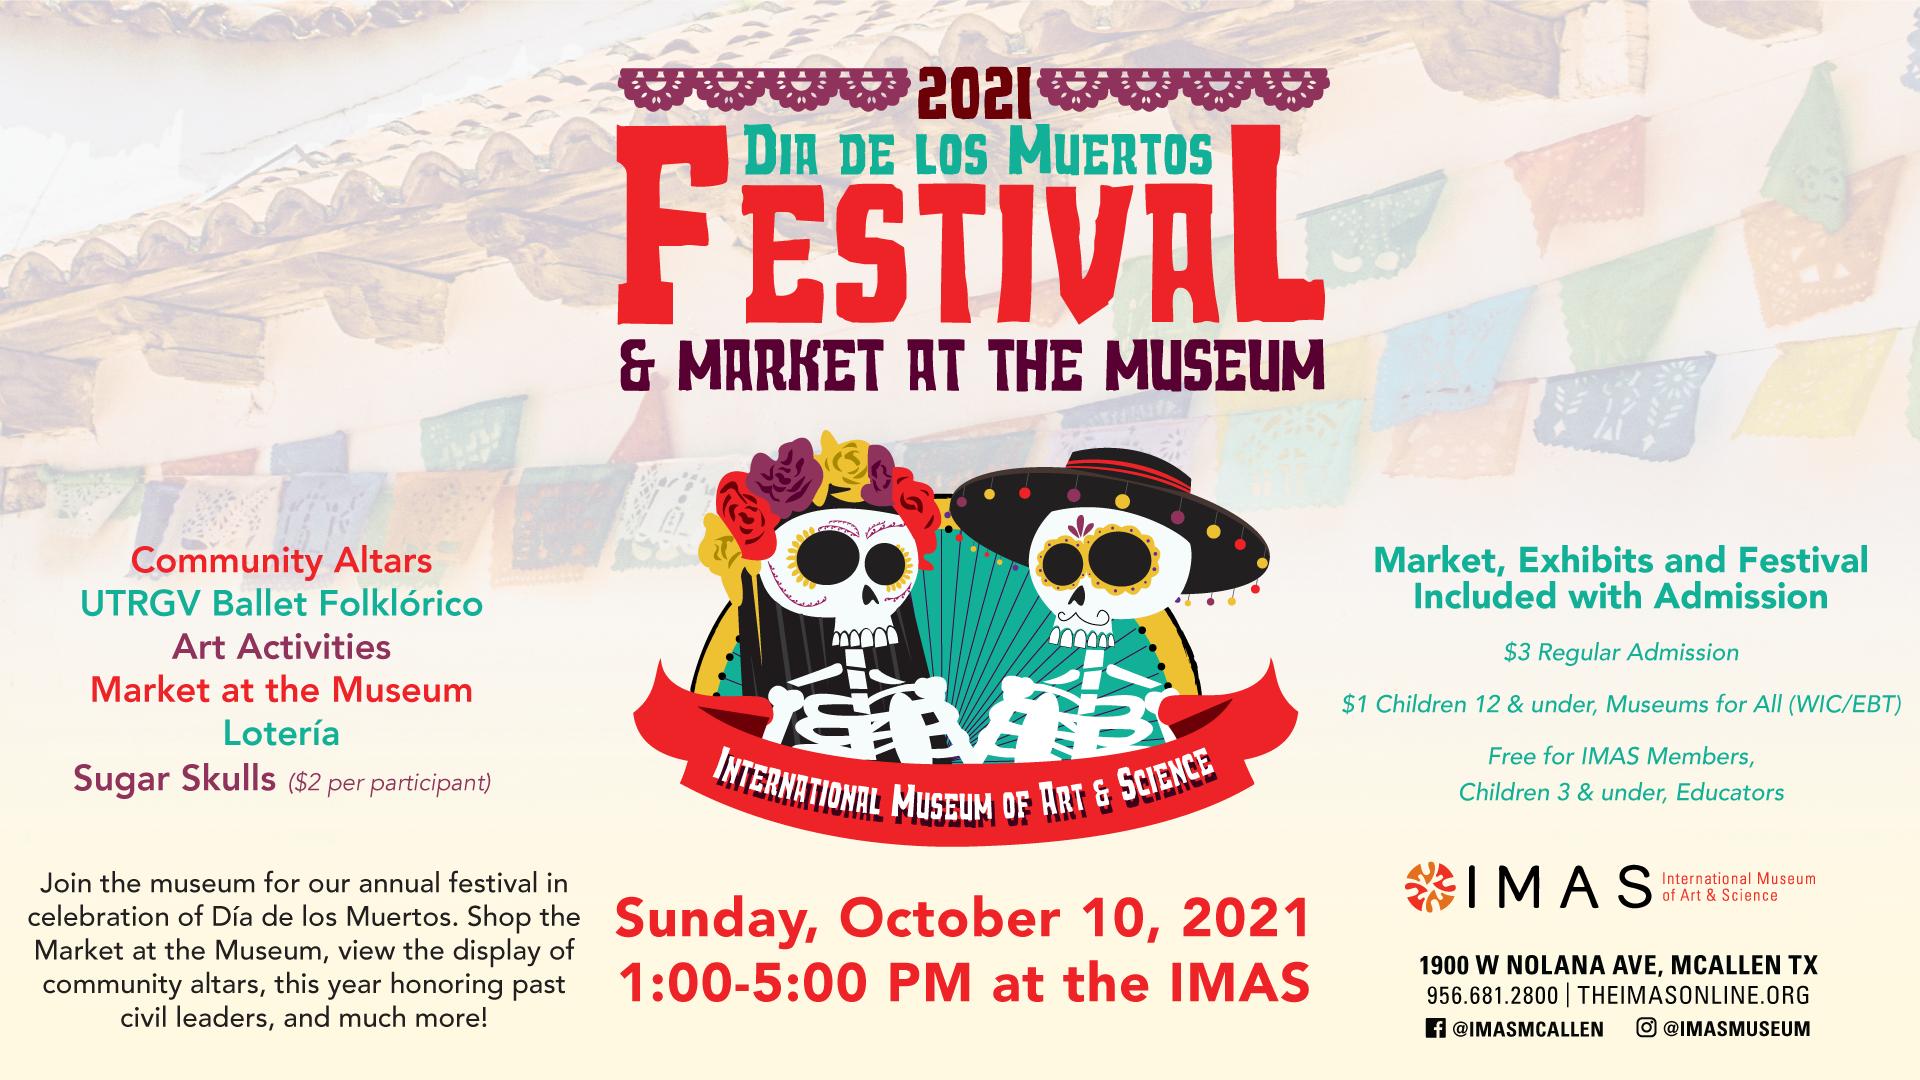 Dia de los Muertos Festival and Market at the Museum